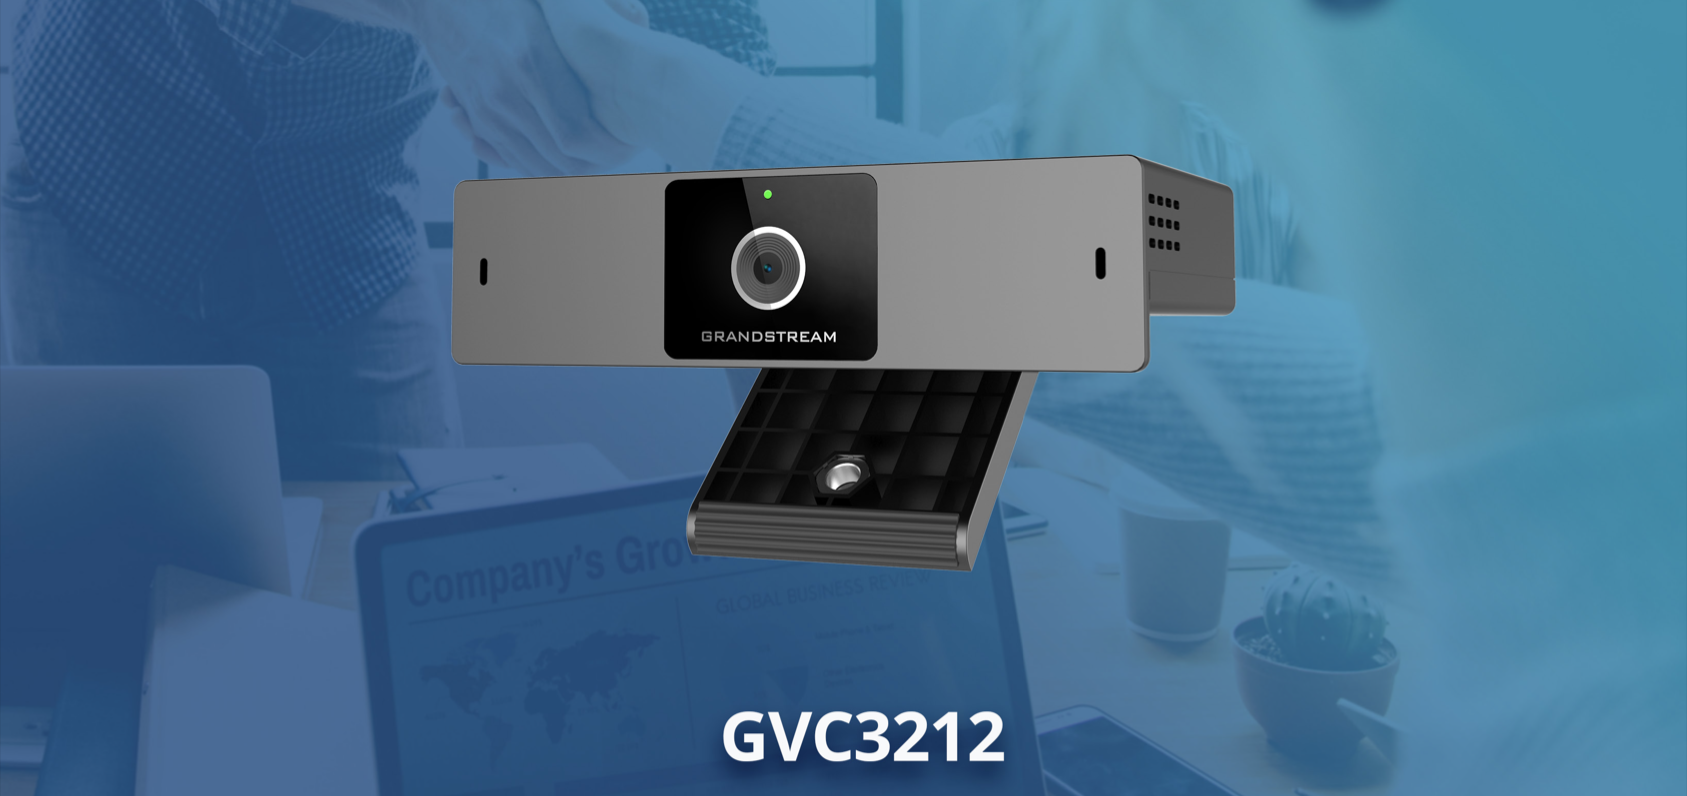 Grandstream GVC3212